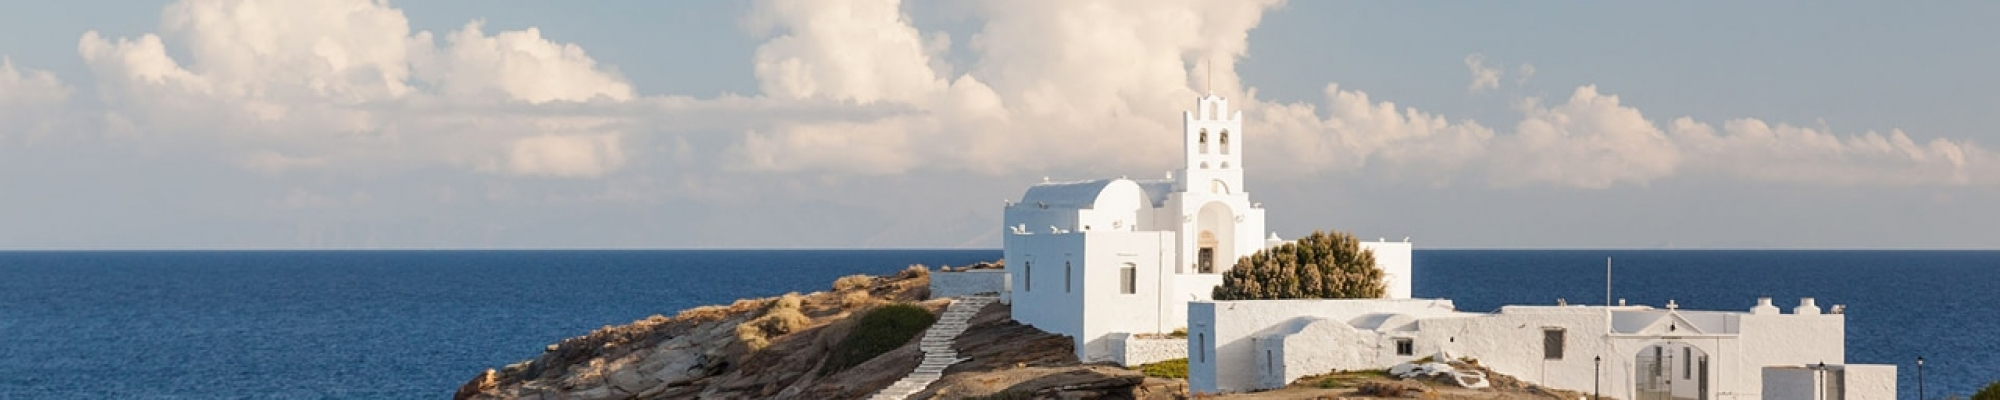 voyage Santorin Grèce